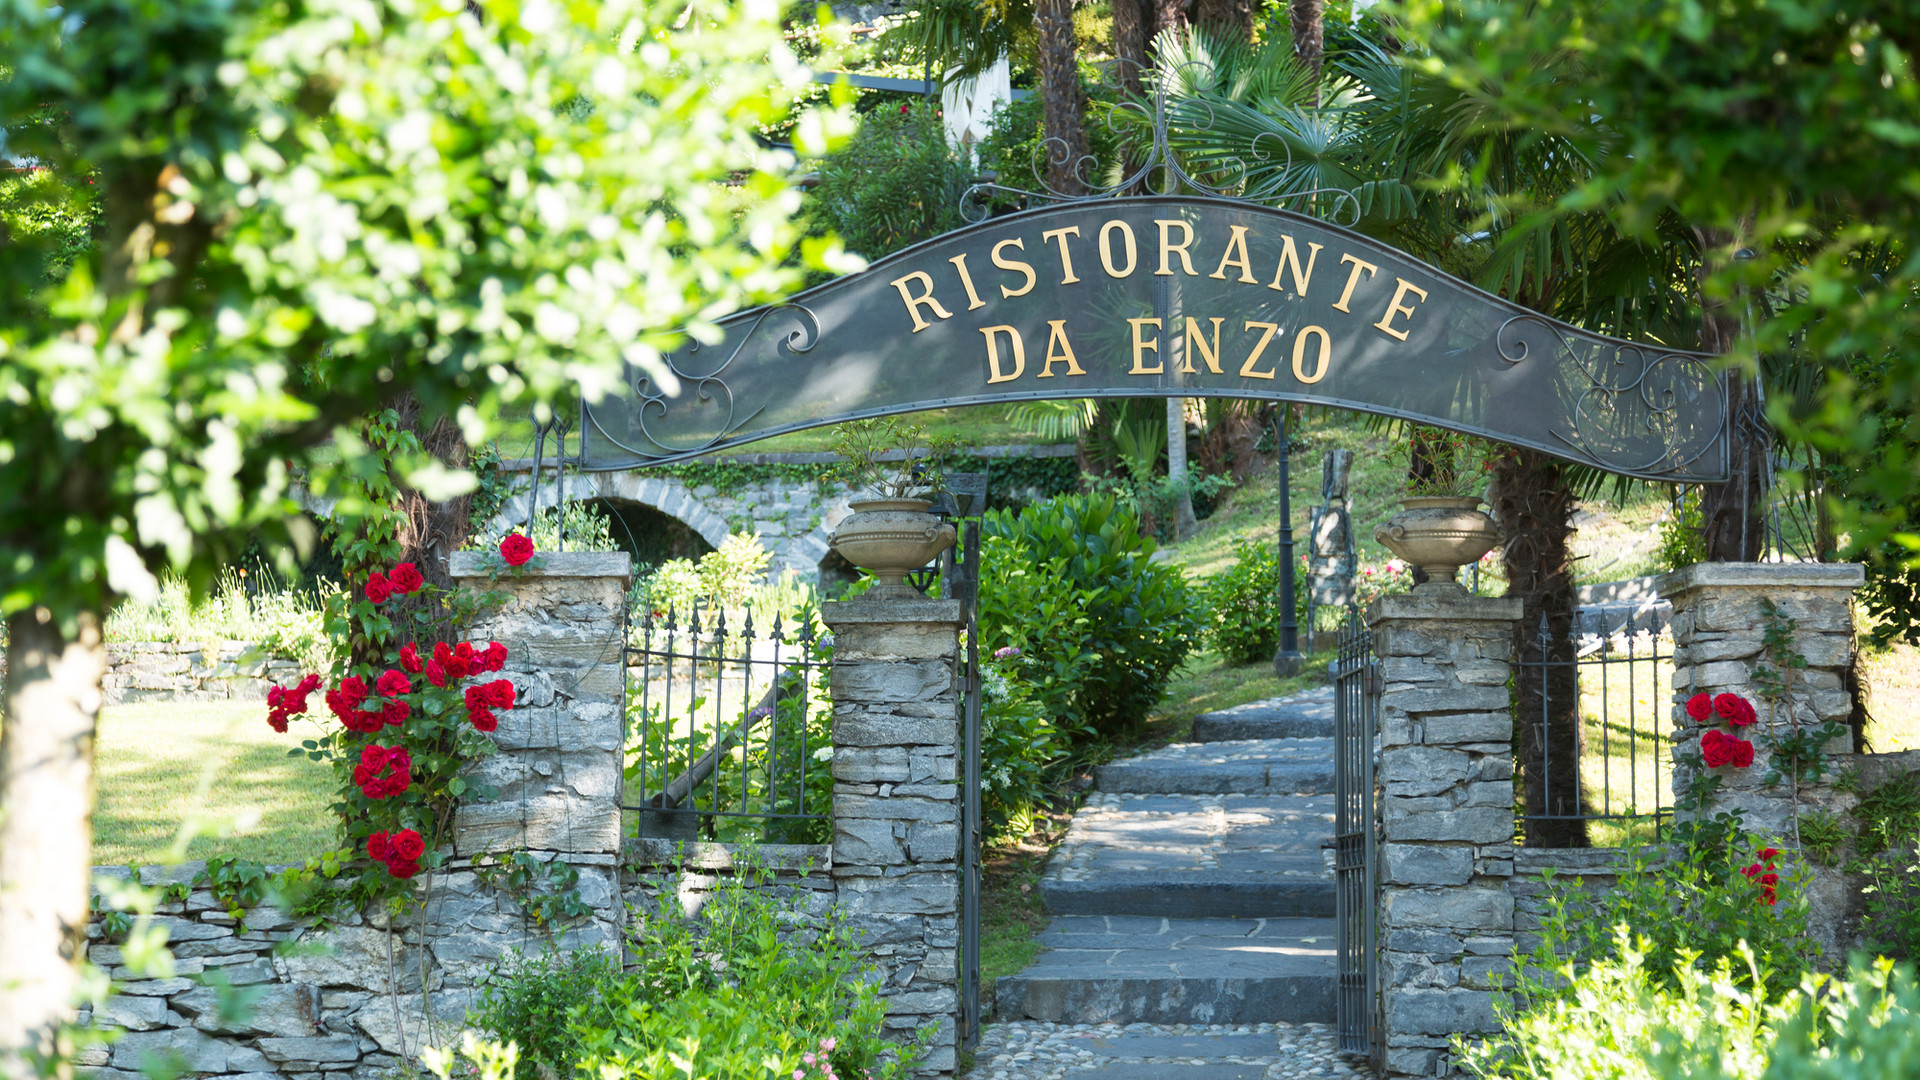 Restaurant da Enzo, entrance